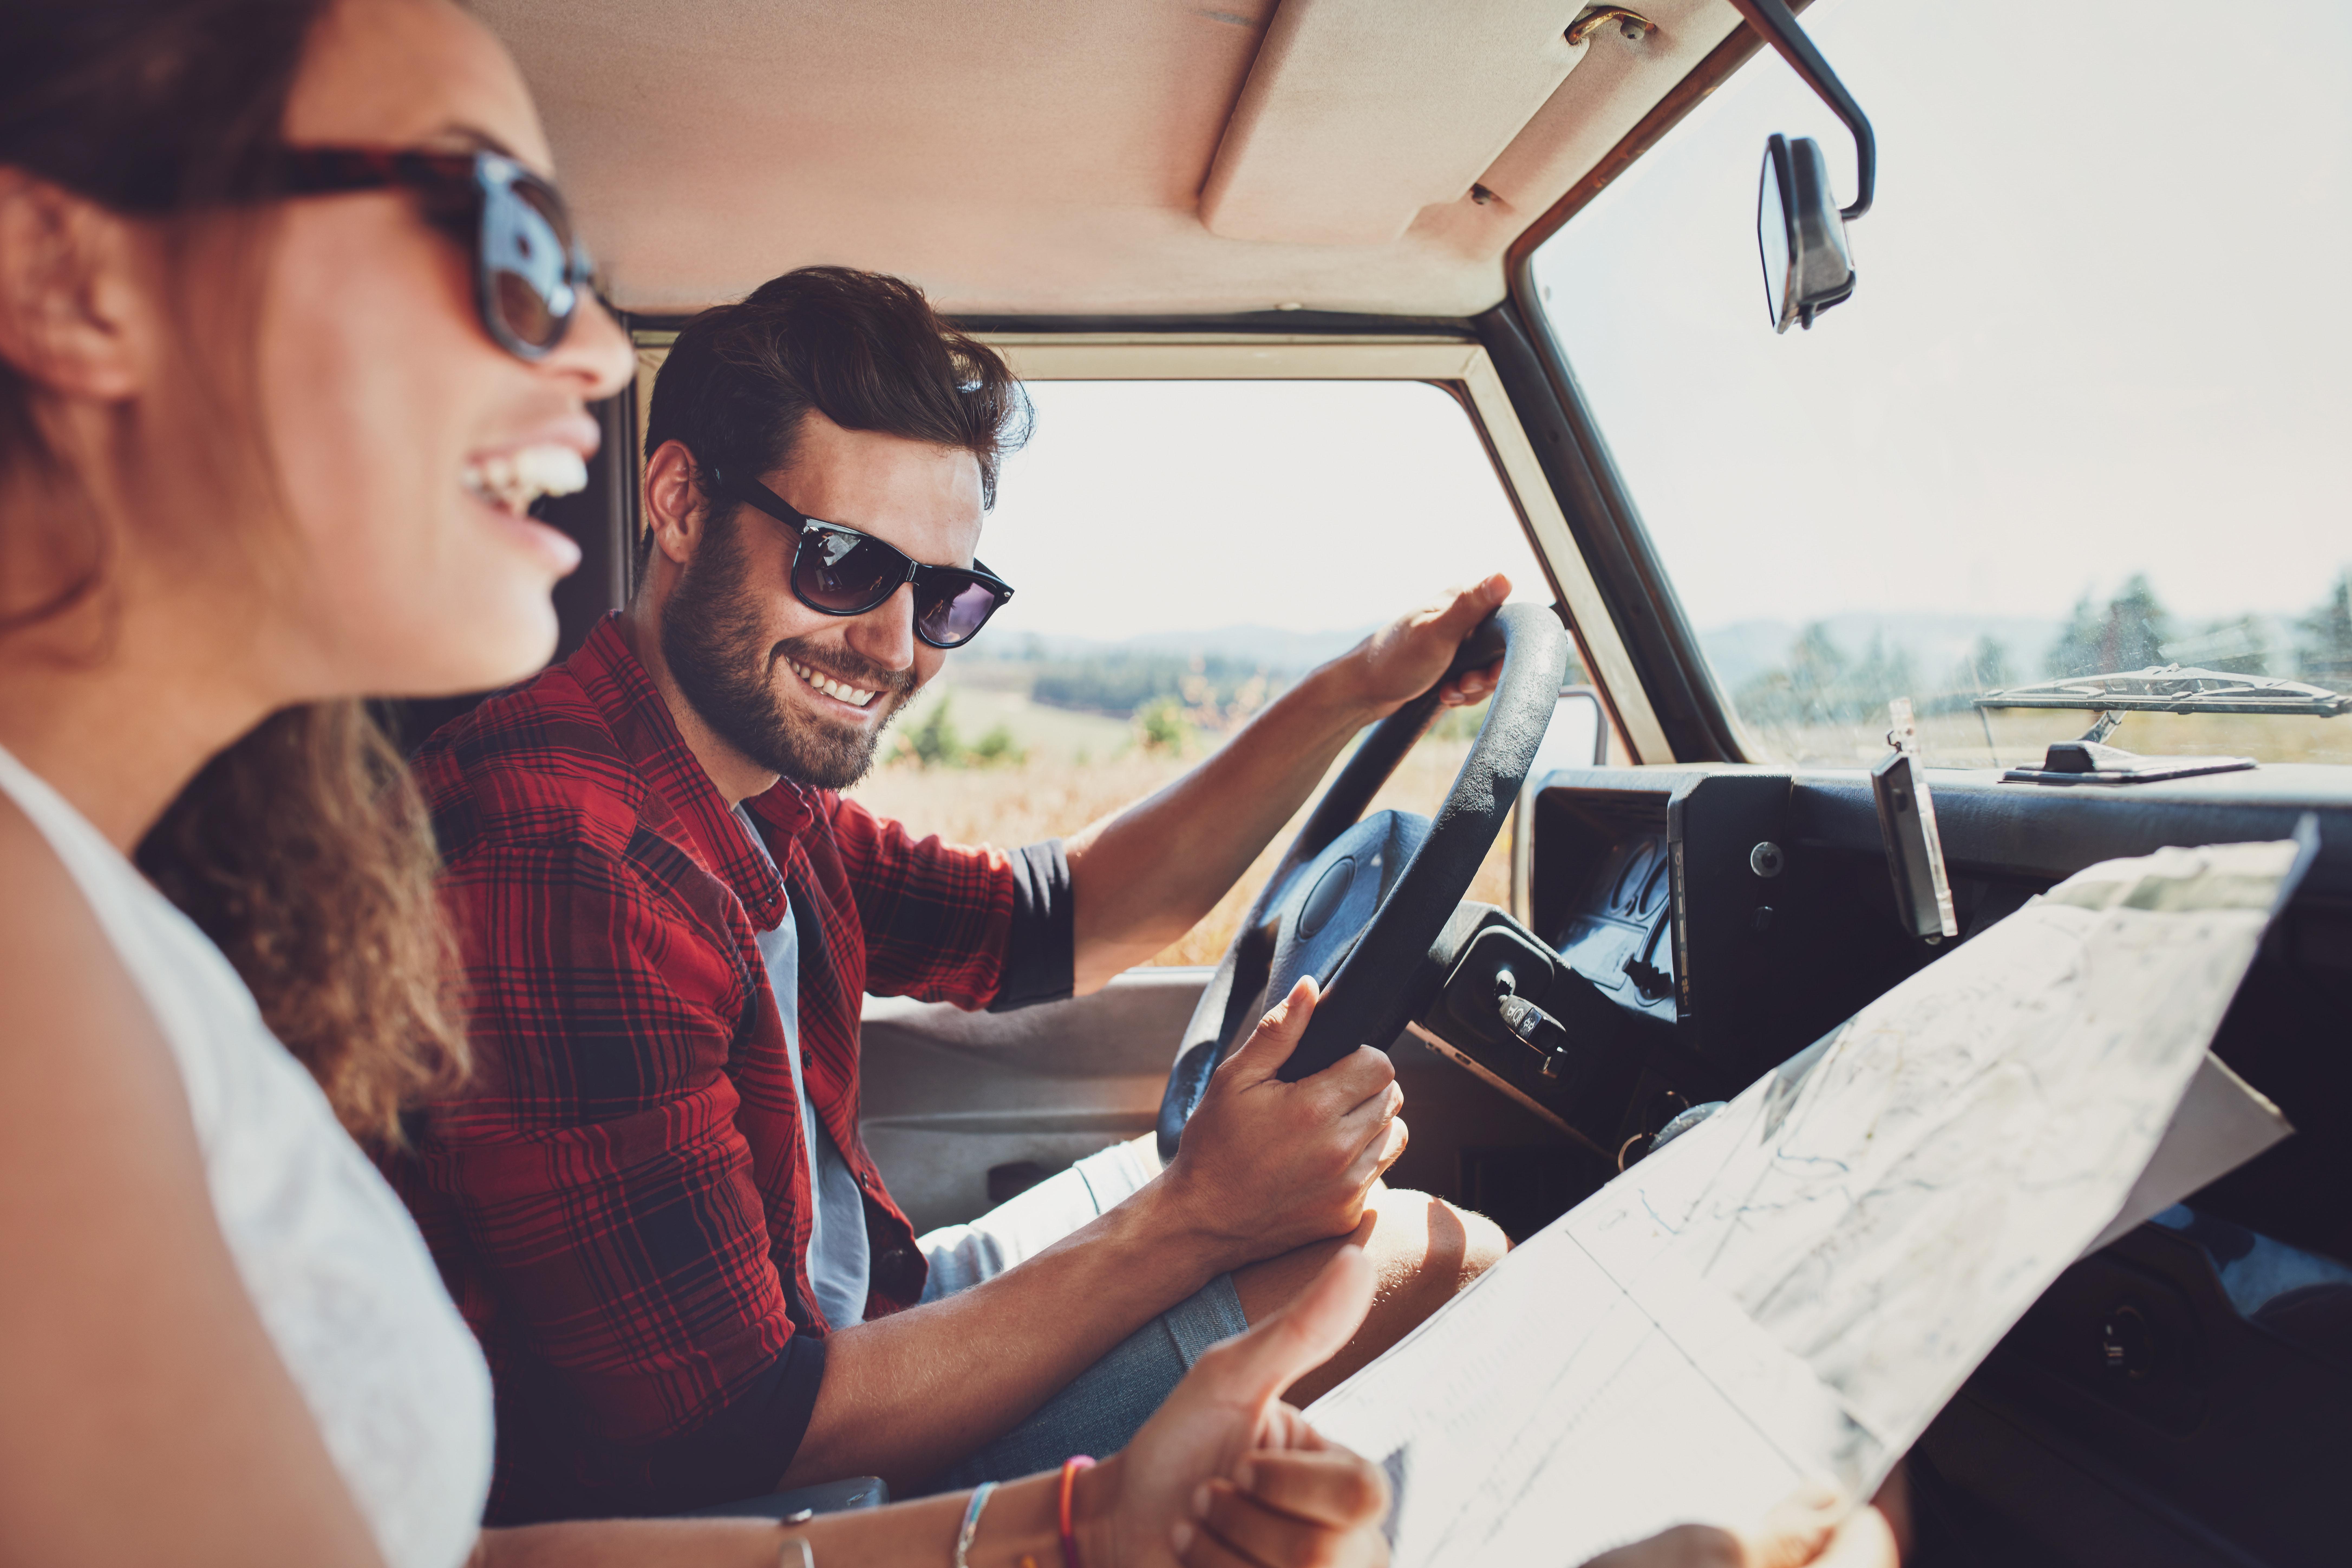 casal numa autocaravana a planear uma roadtrip